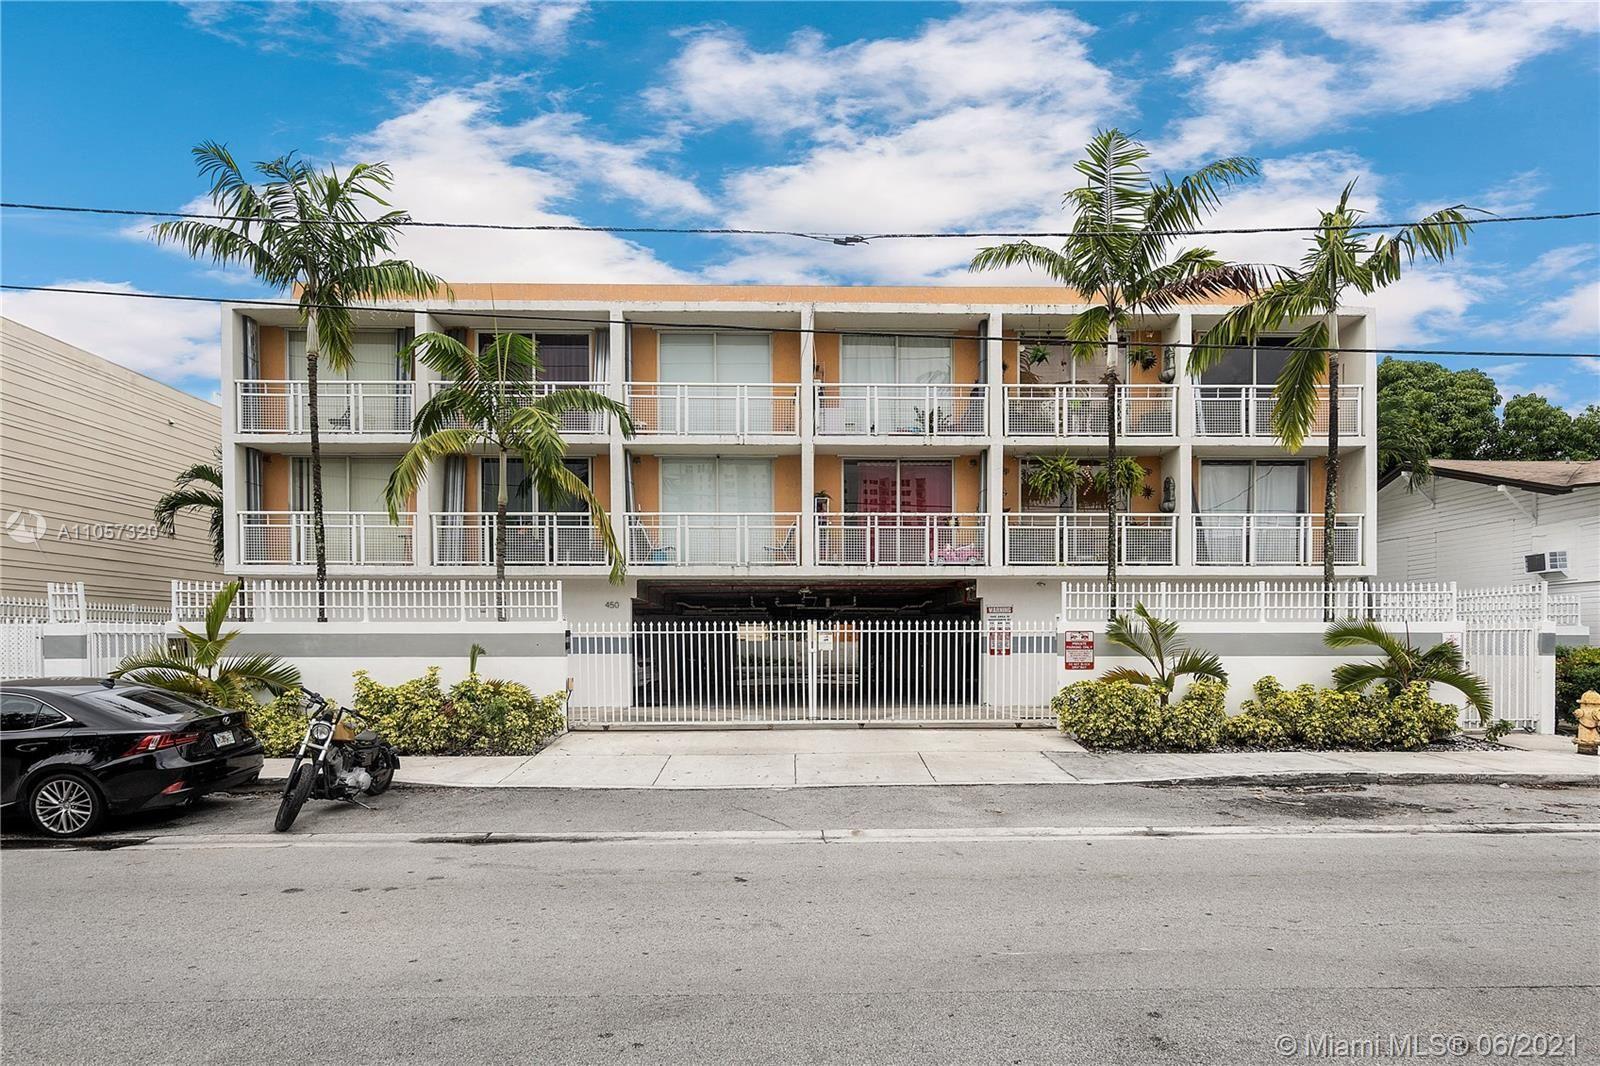 450 SW 3rd St #12, Miami, FL 33130 - #: A11057320